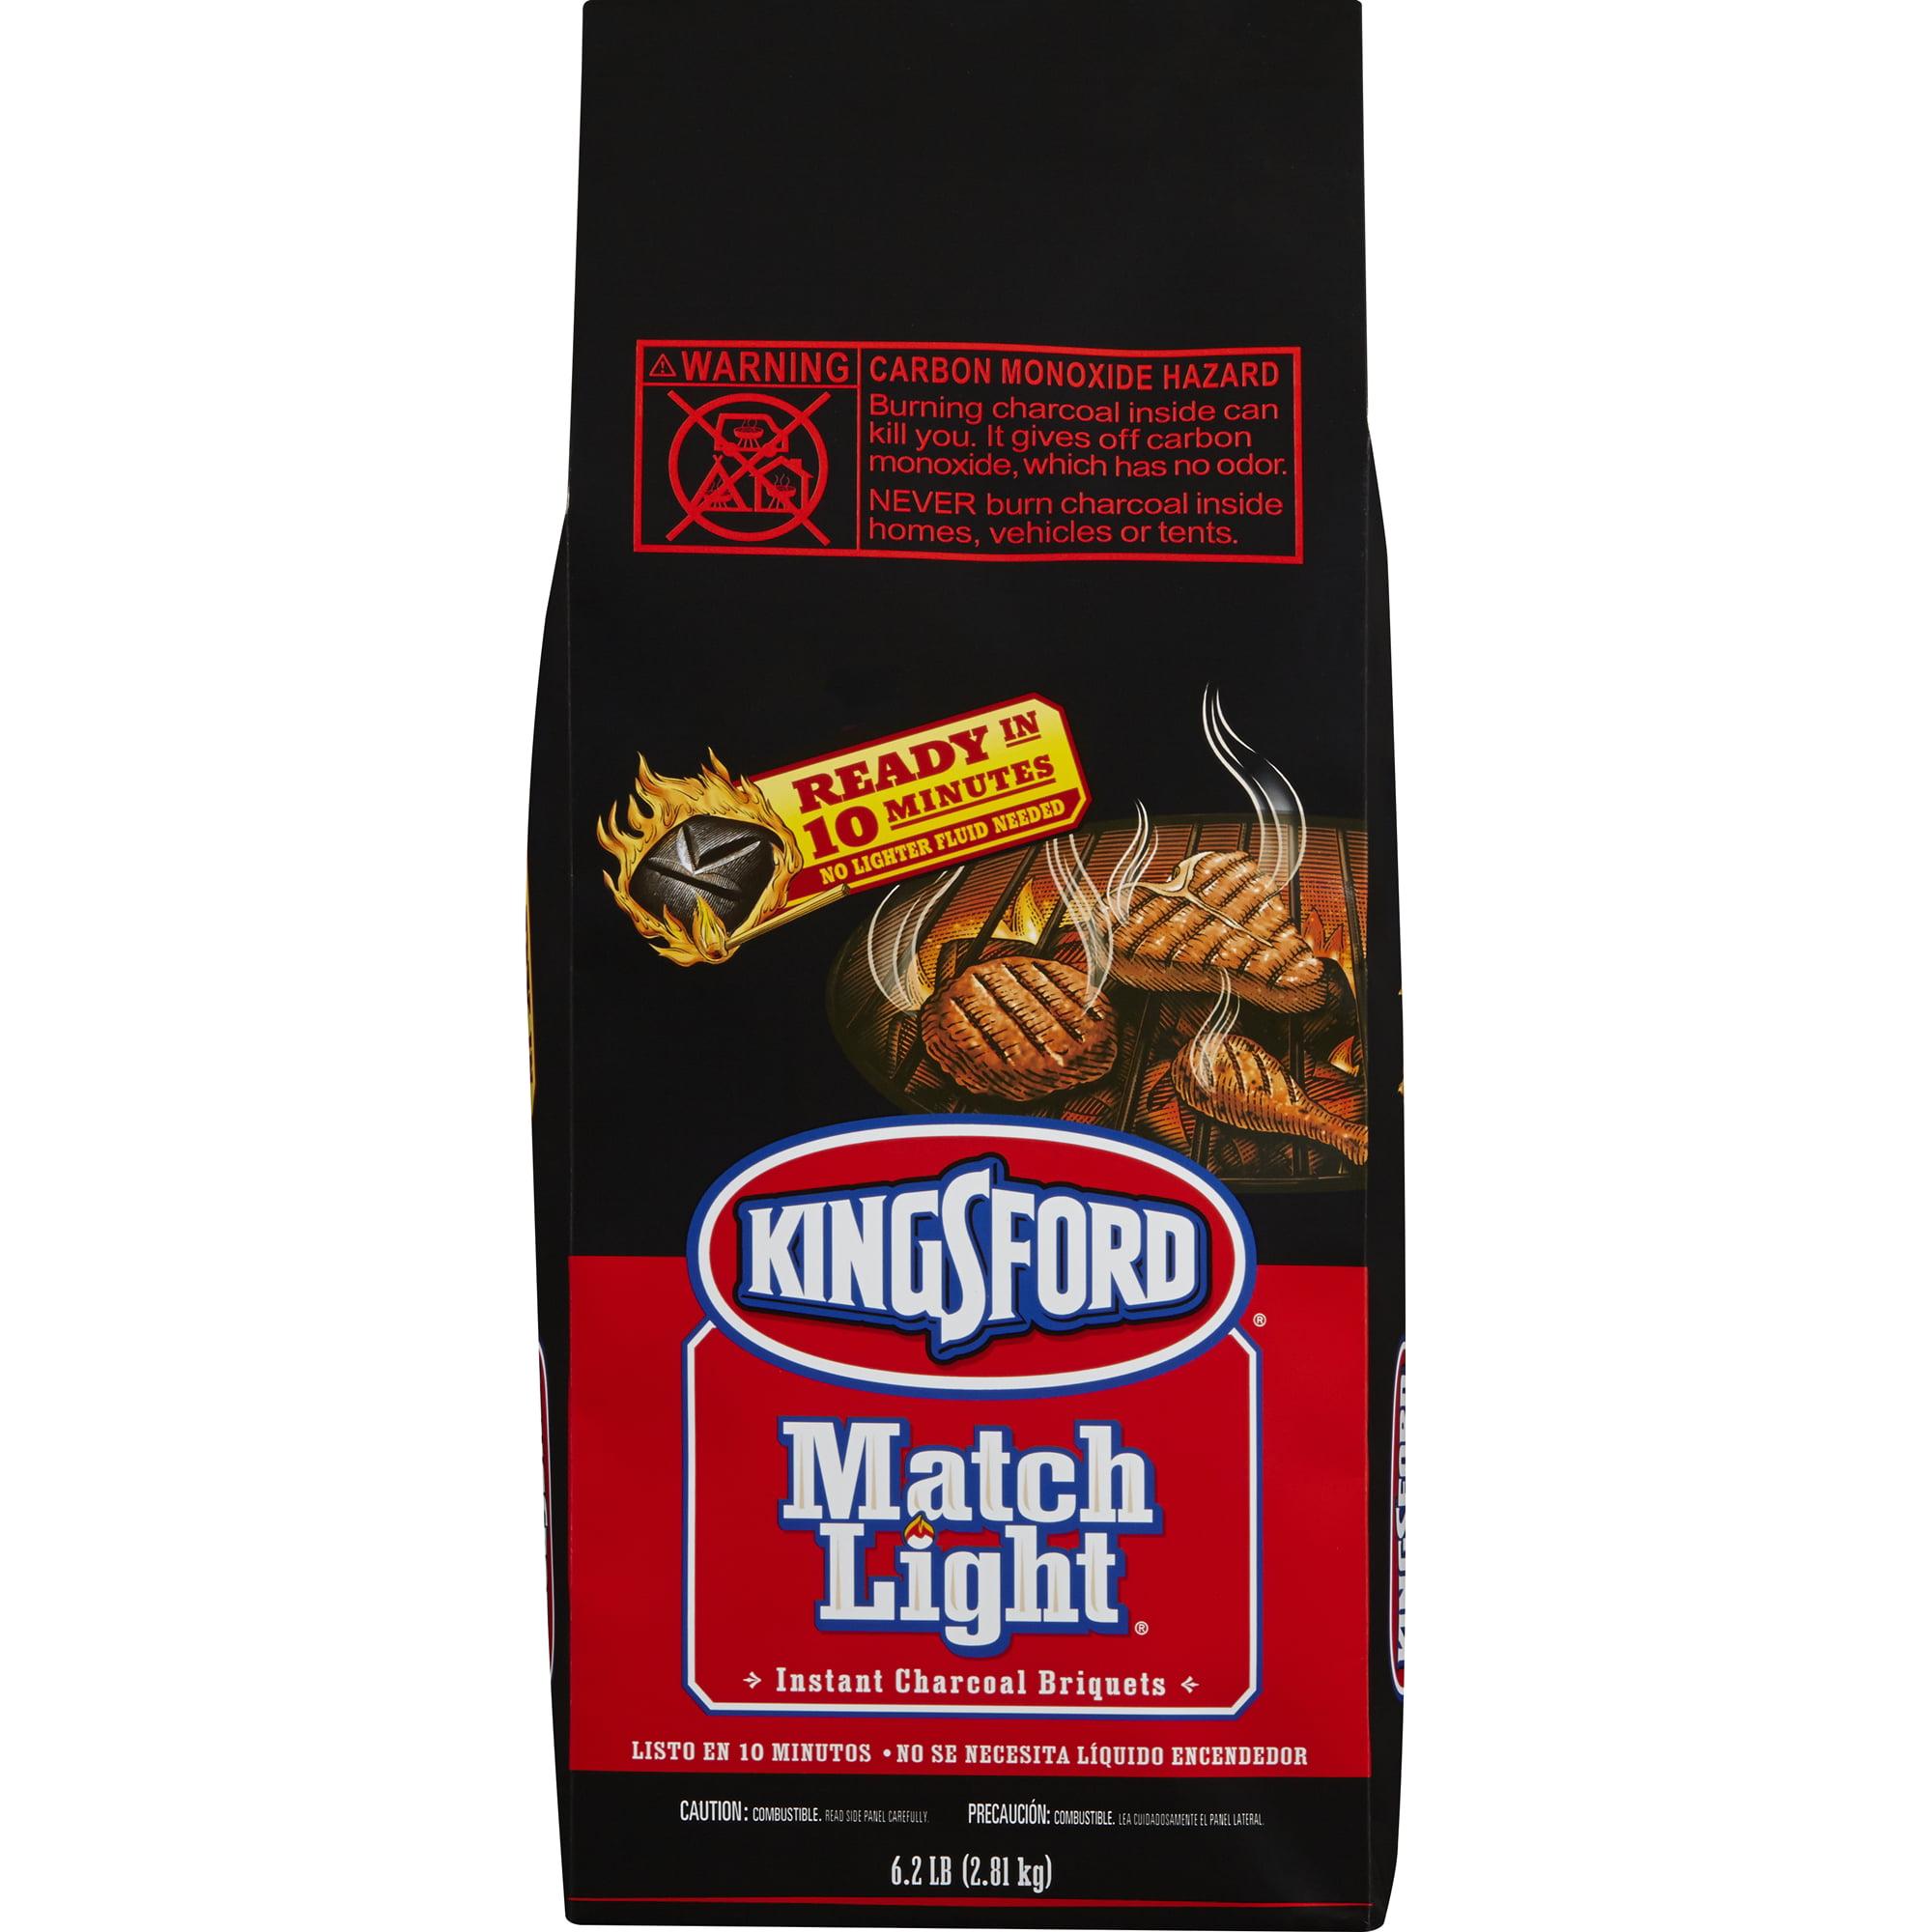 Kingsford Match Light Charcoal Briquets, 6.2 Pound Bag